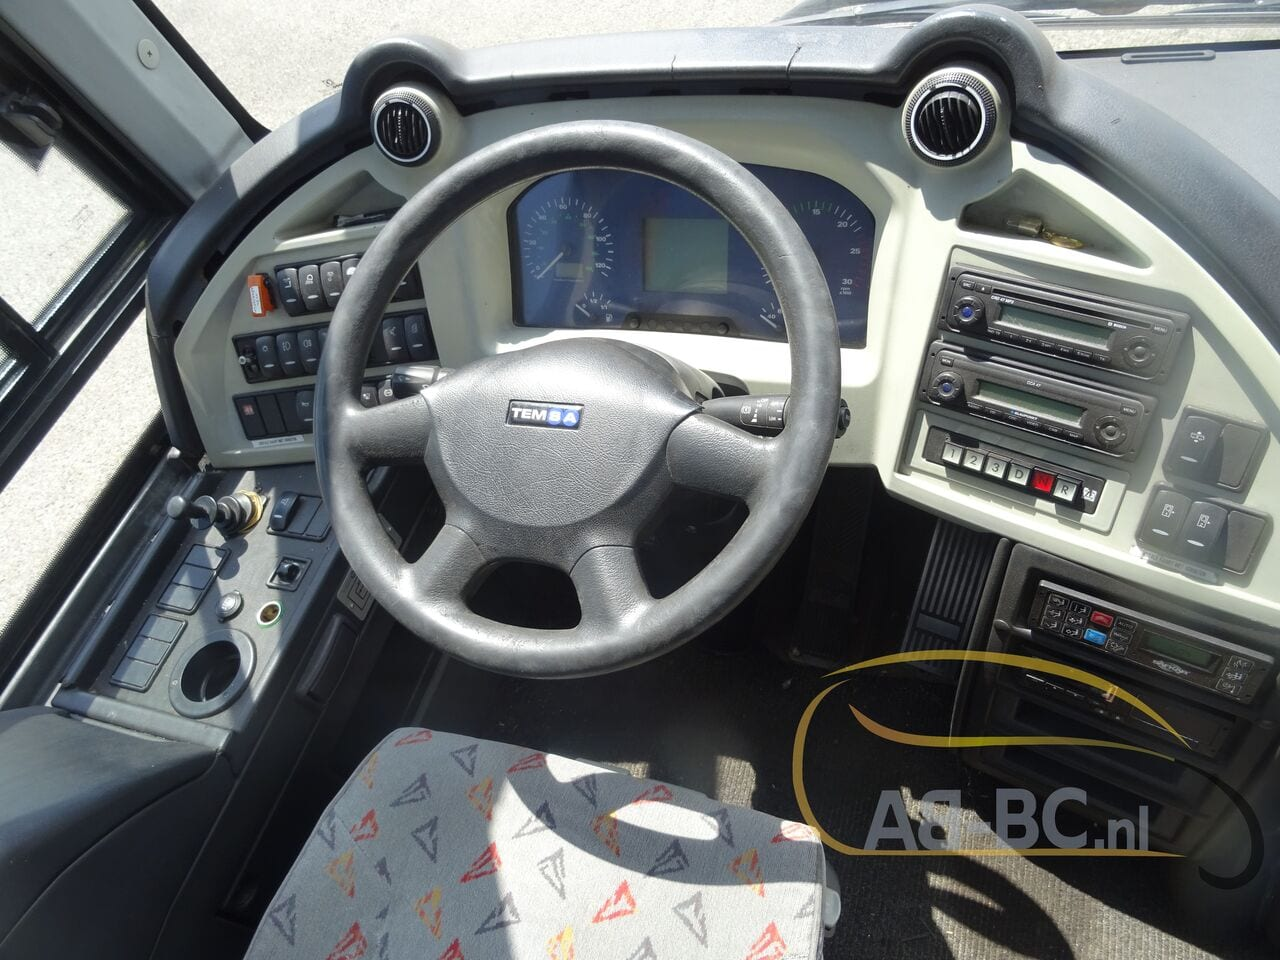 coach-busTEMSA-Safari-RD-DAF-Motor-53-Seats-Euro-5---1623932393405000496_big_24d546f1f557b58b90342c3a55ce2533--21061715155620919600